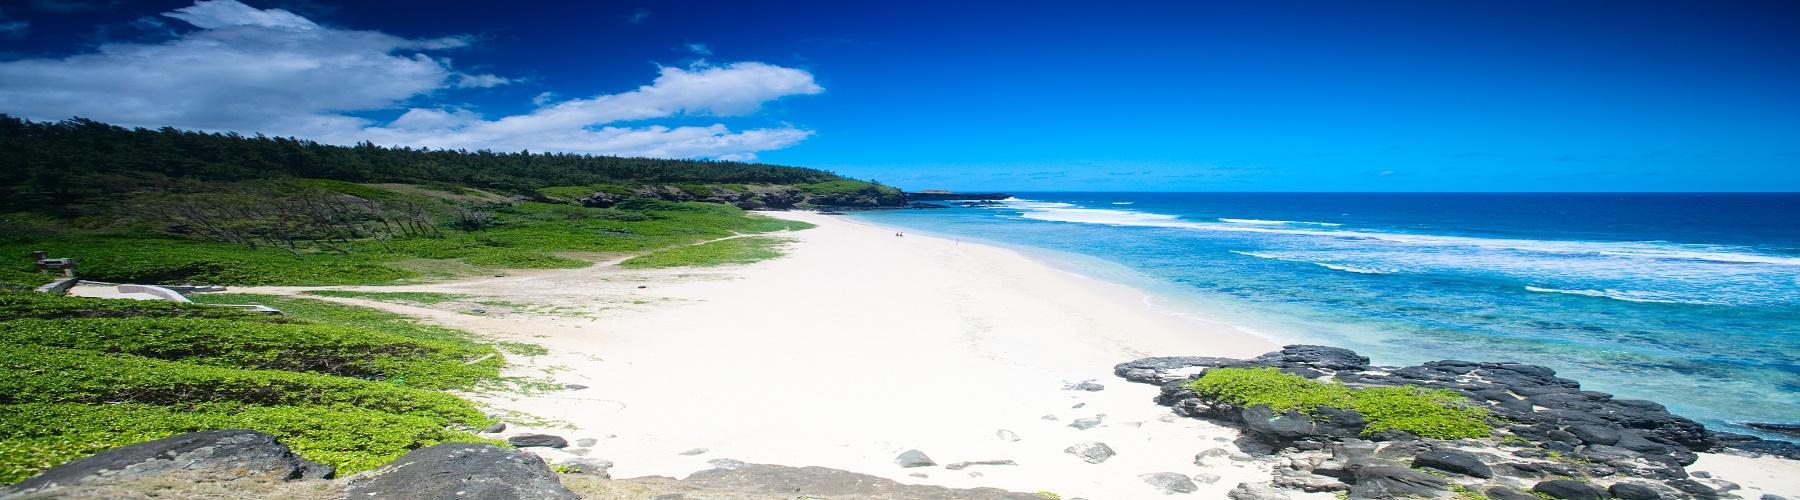 Пляжи на Маврикий